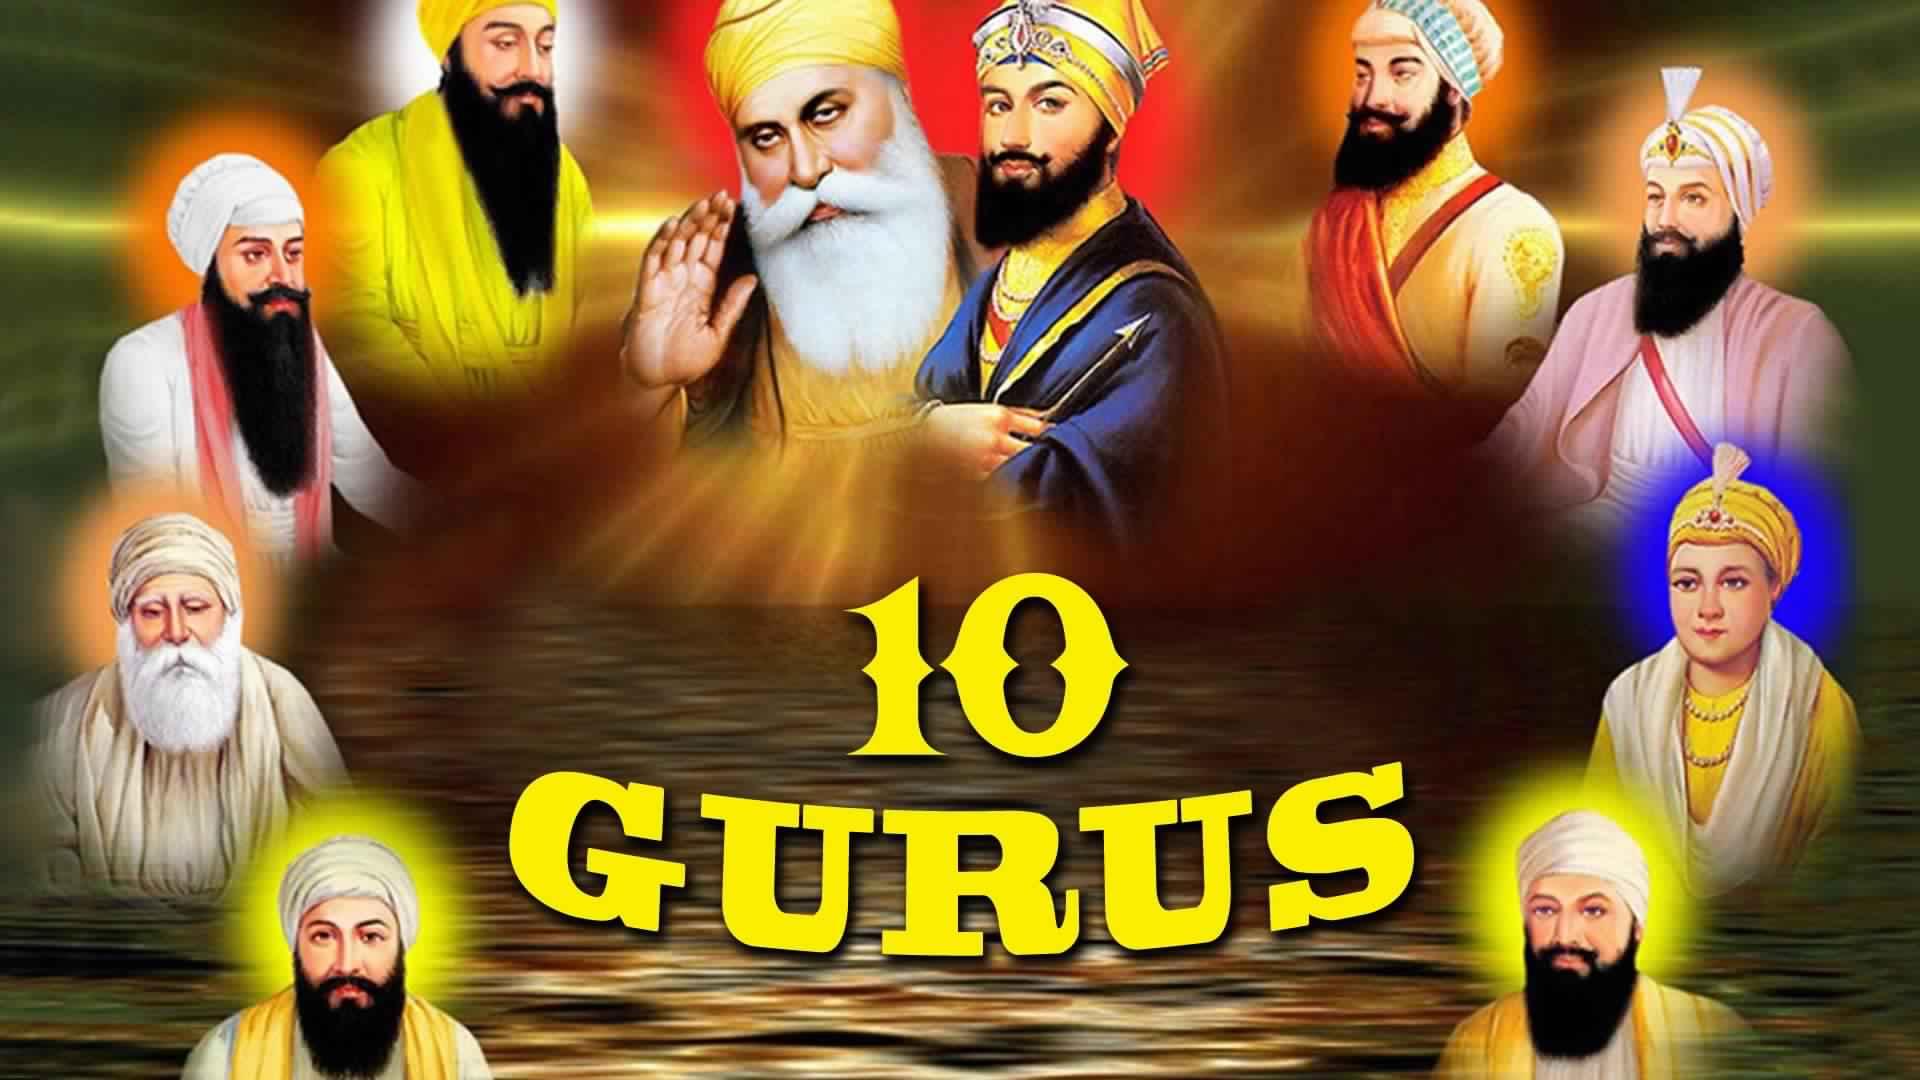 10 Gurus Of Sikhism Wallpapers Hd